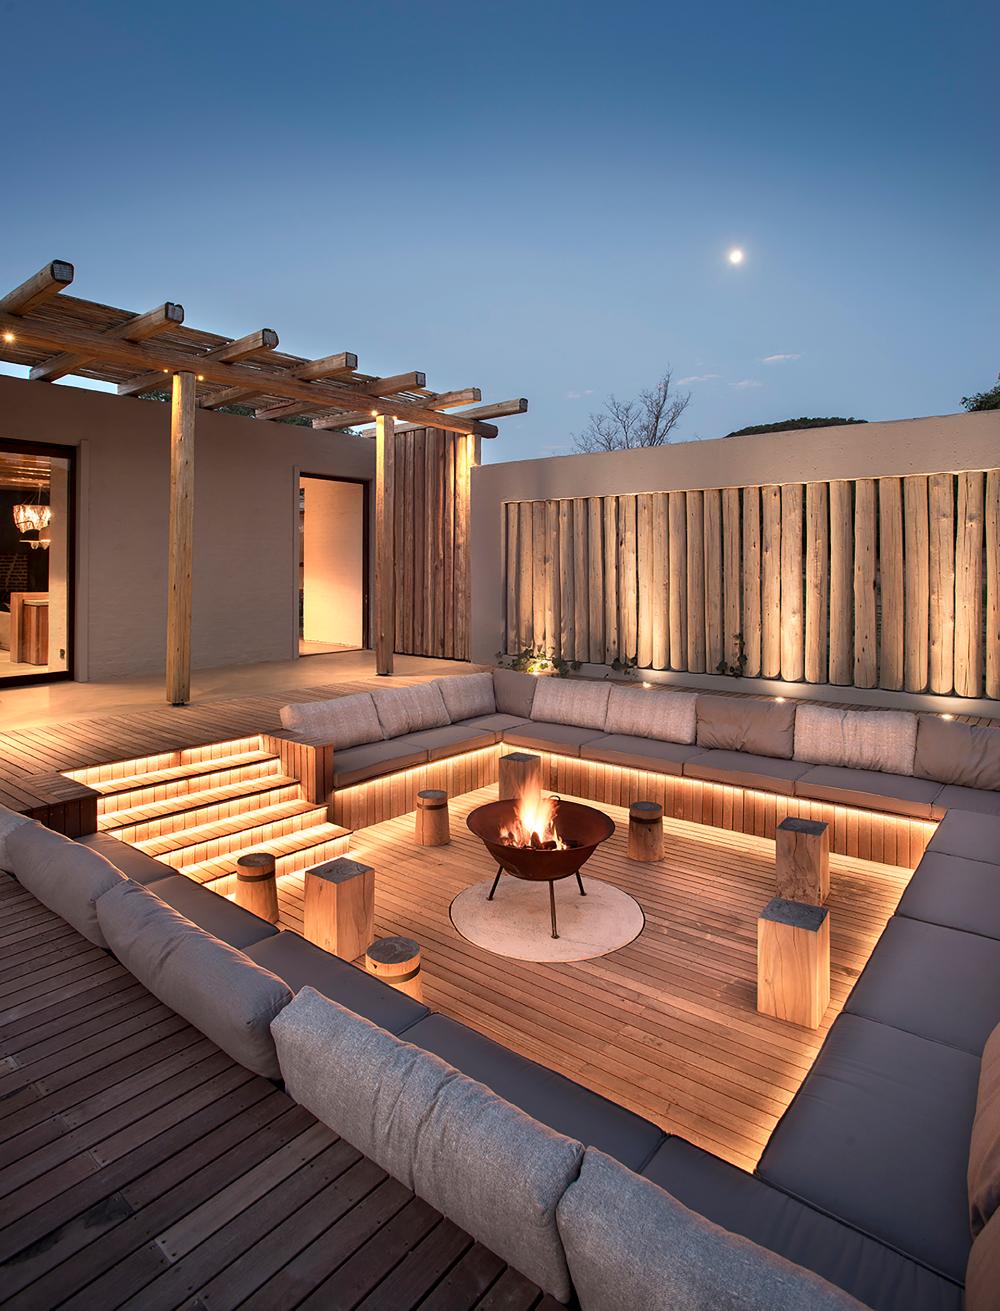 Residential, Villa Designs: Bush Home, Mabote, Joh